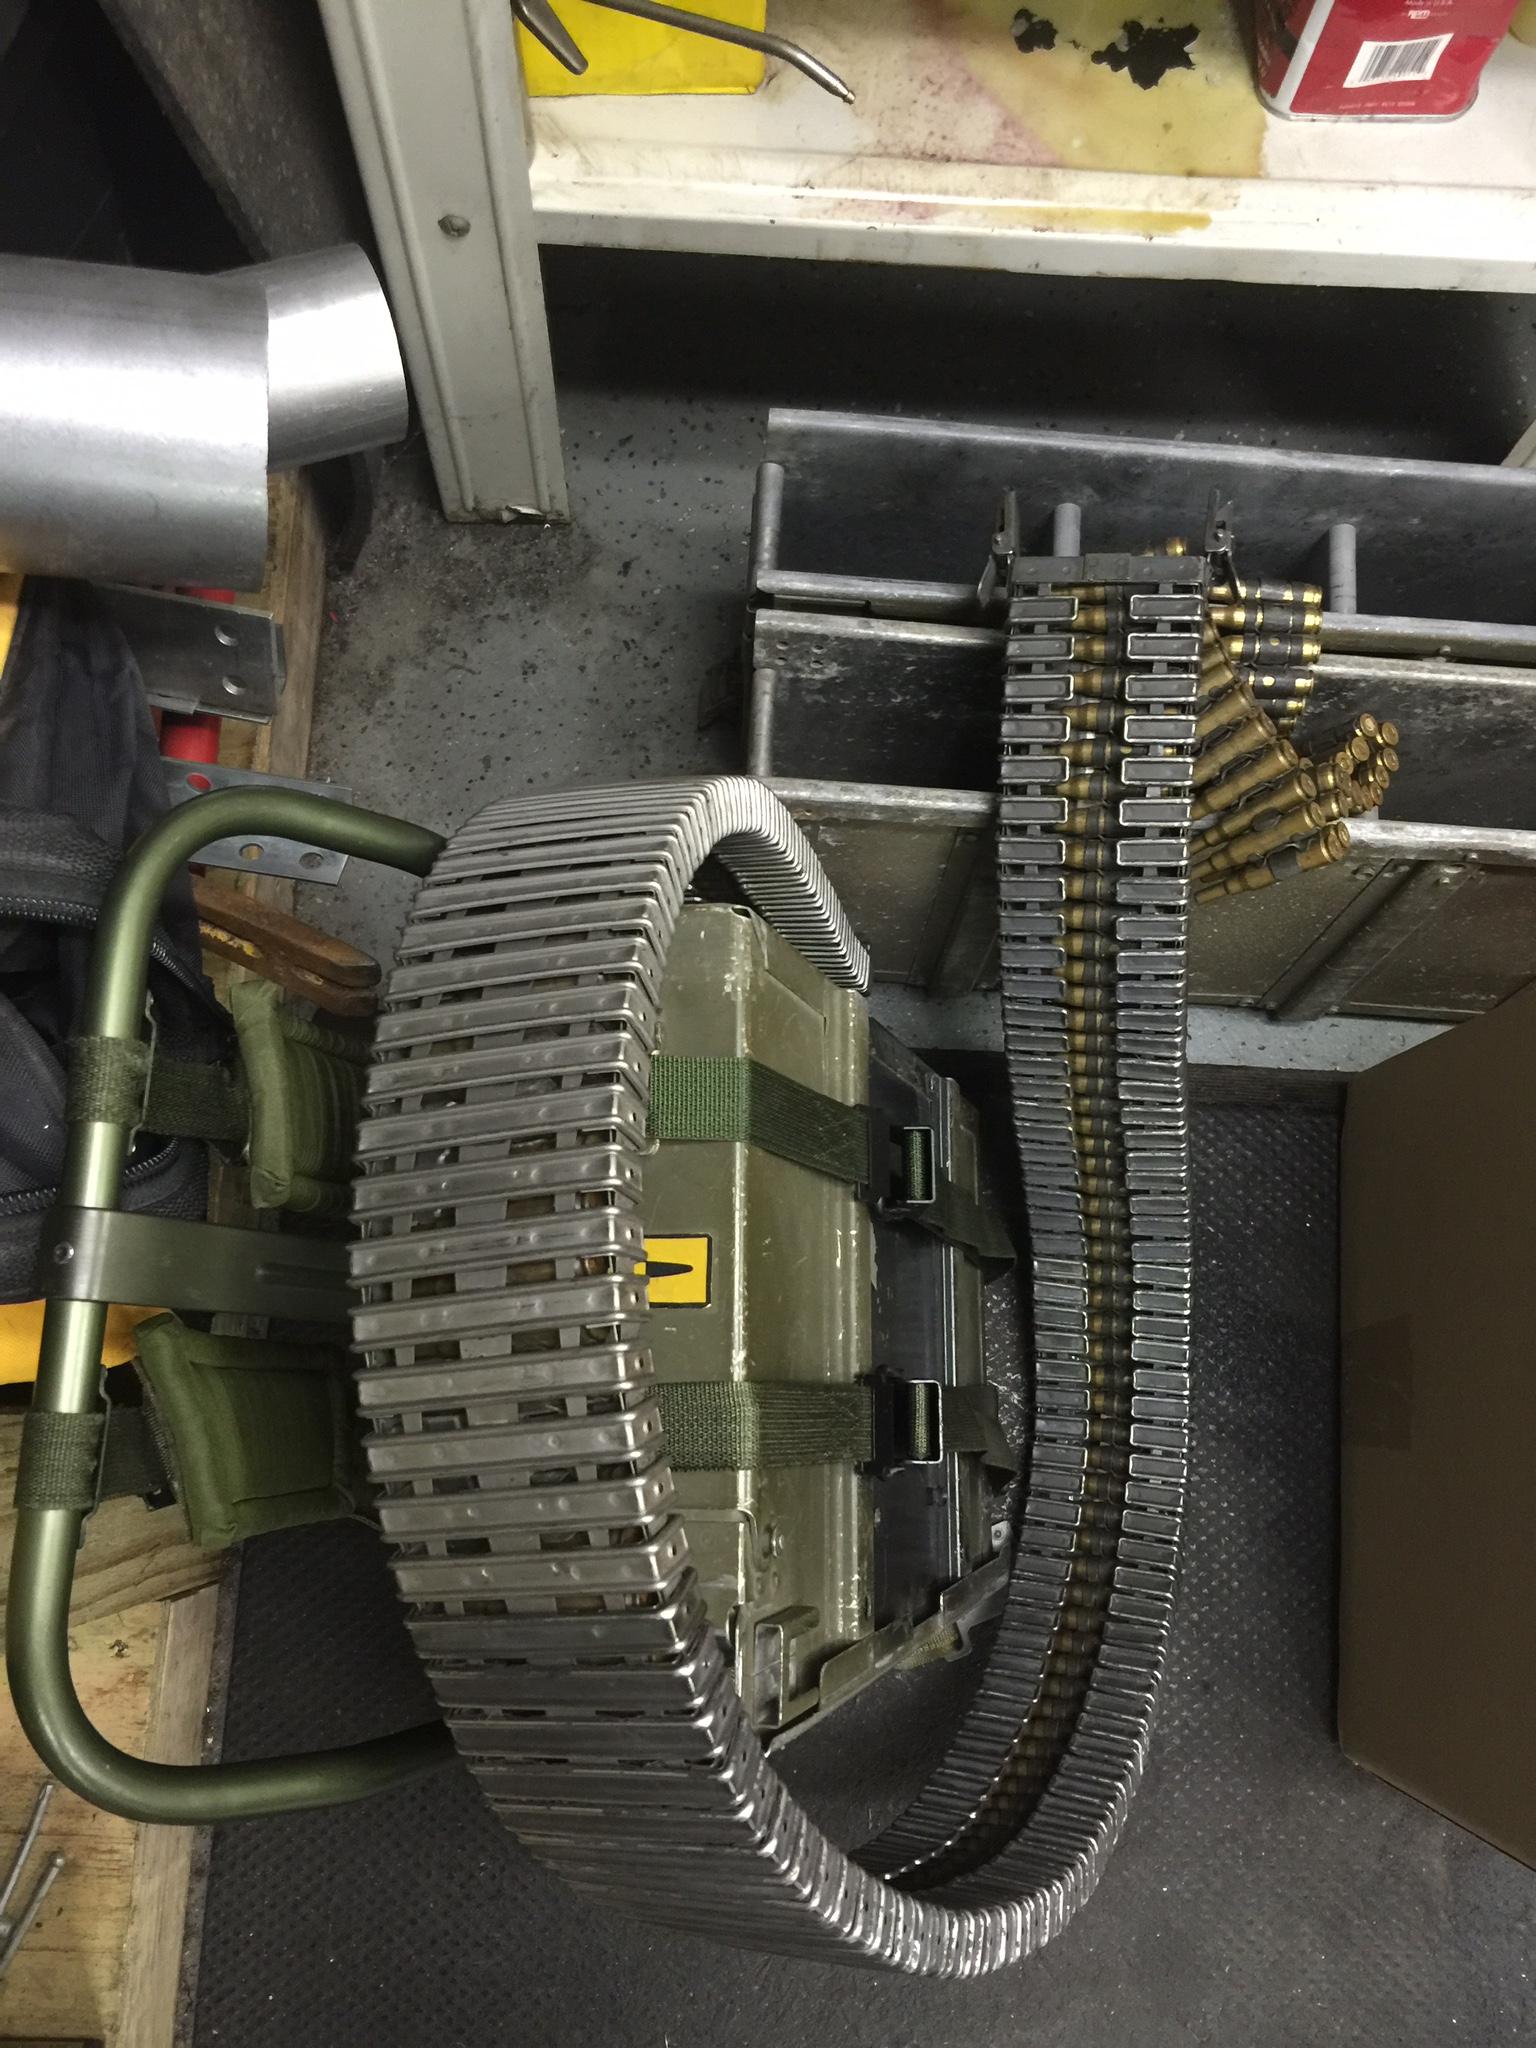 M134 Predator Minigun Ol' Painless, building a exact replica